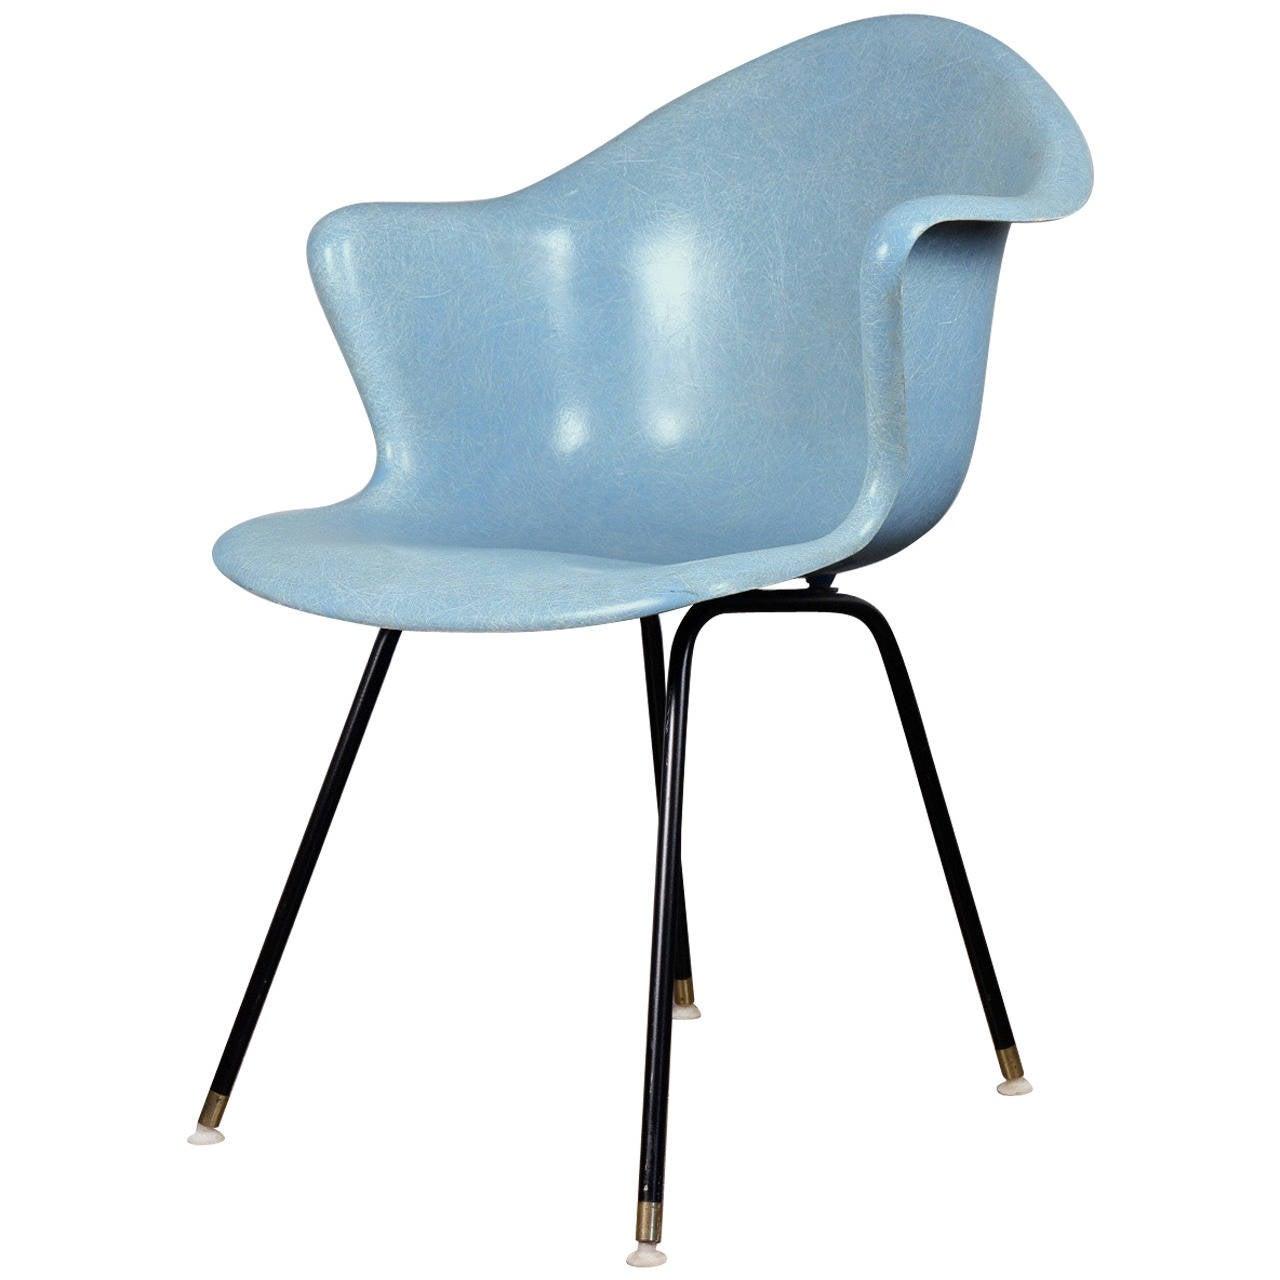 Eiffel armchair vitra daw von charles ray eames 1950 for Imitation chaise vitra